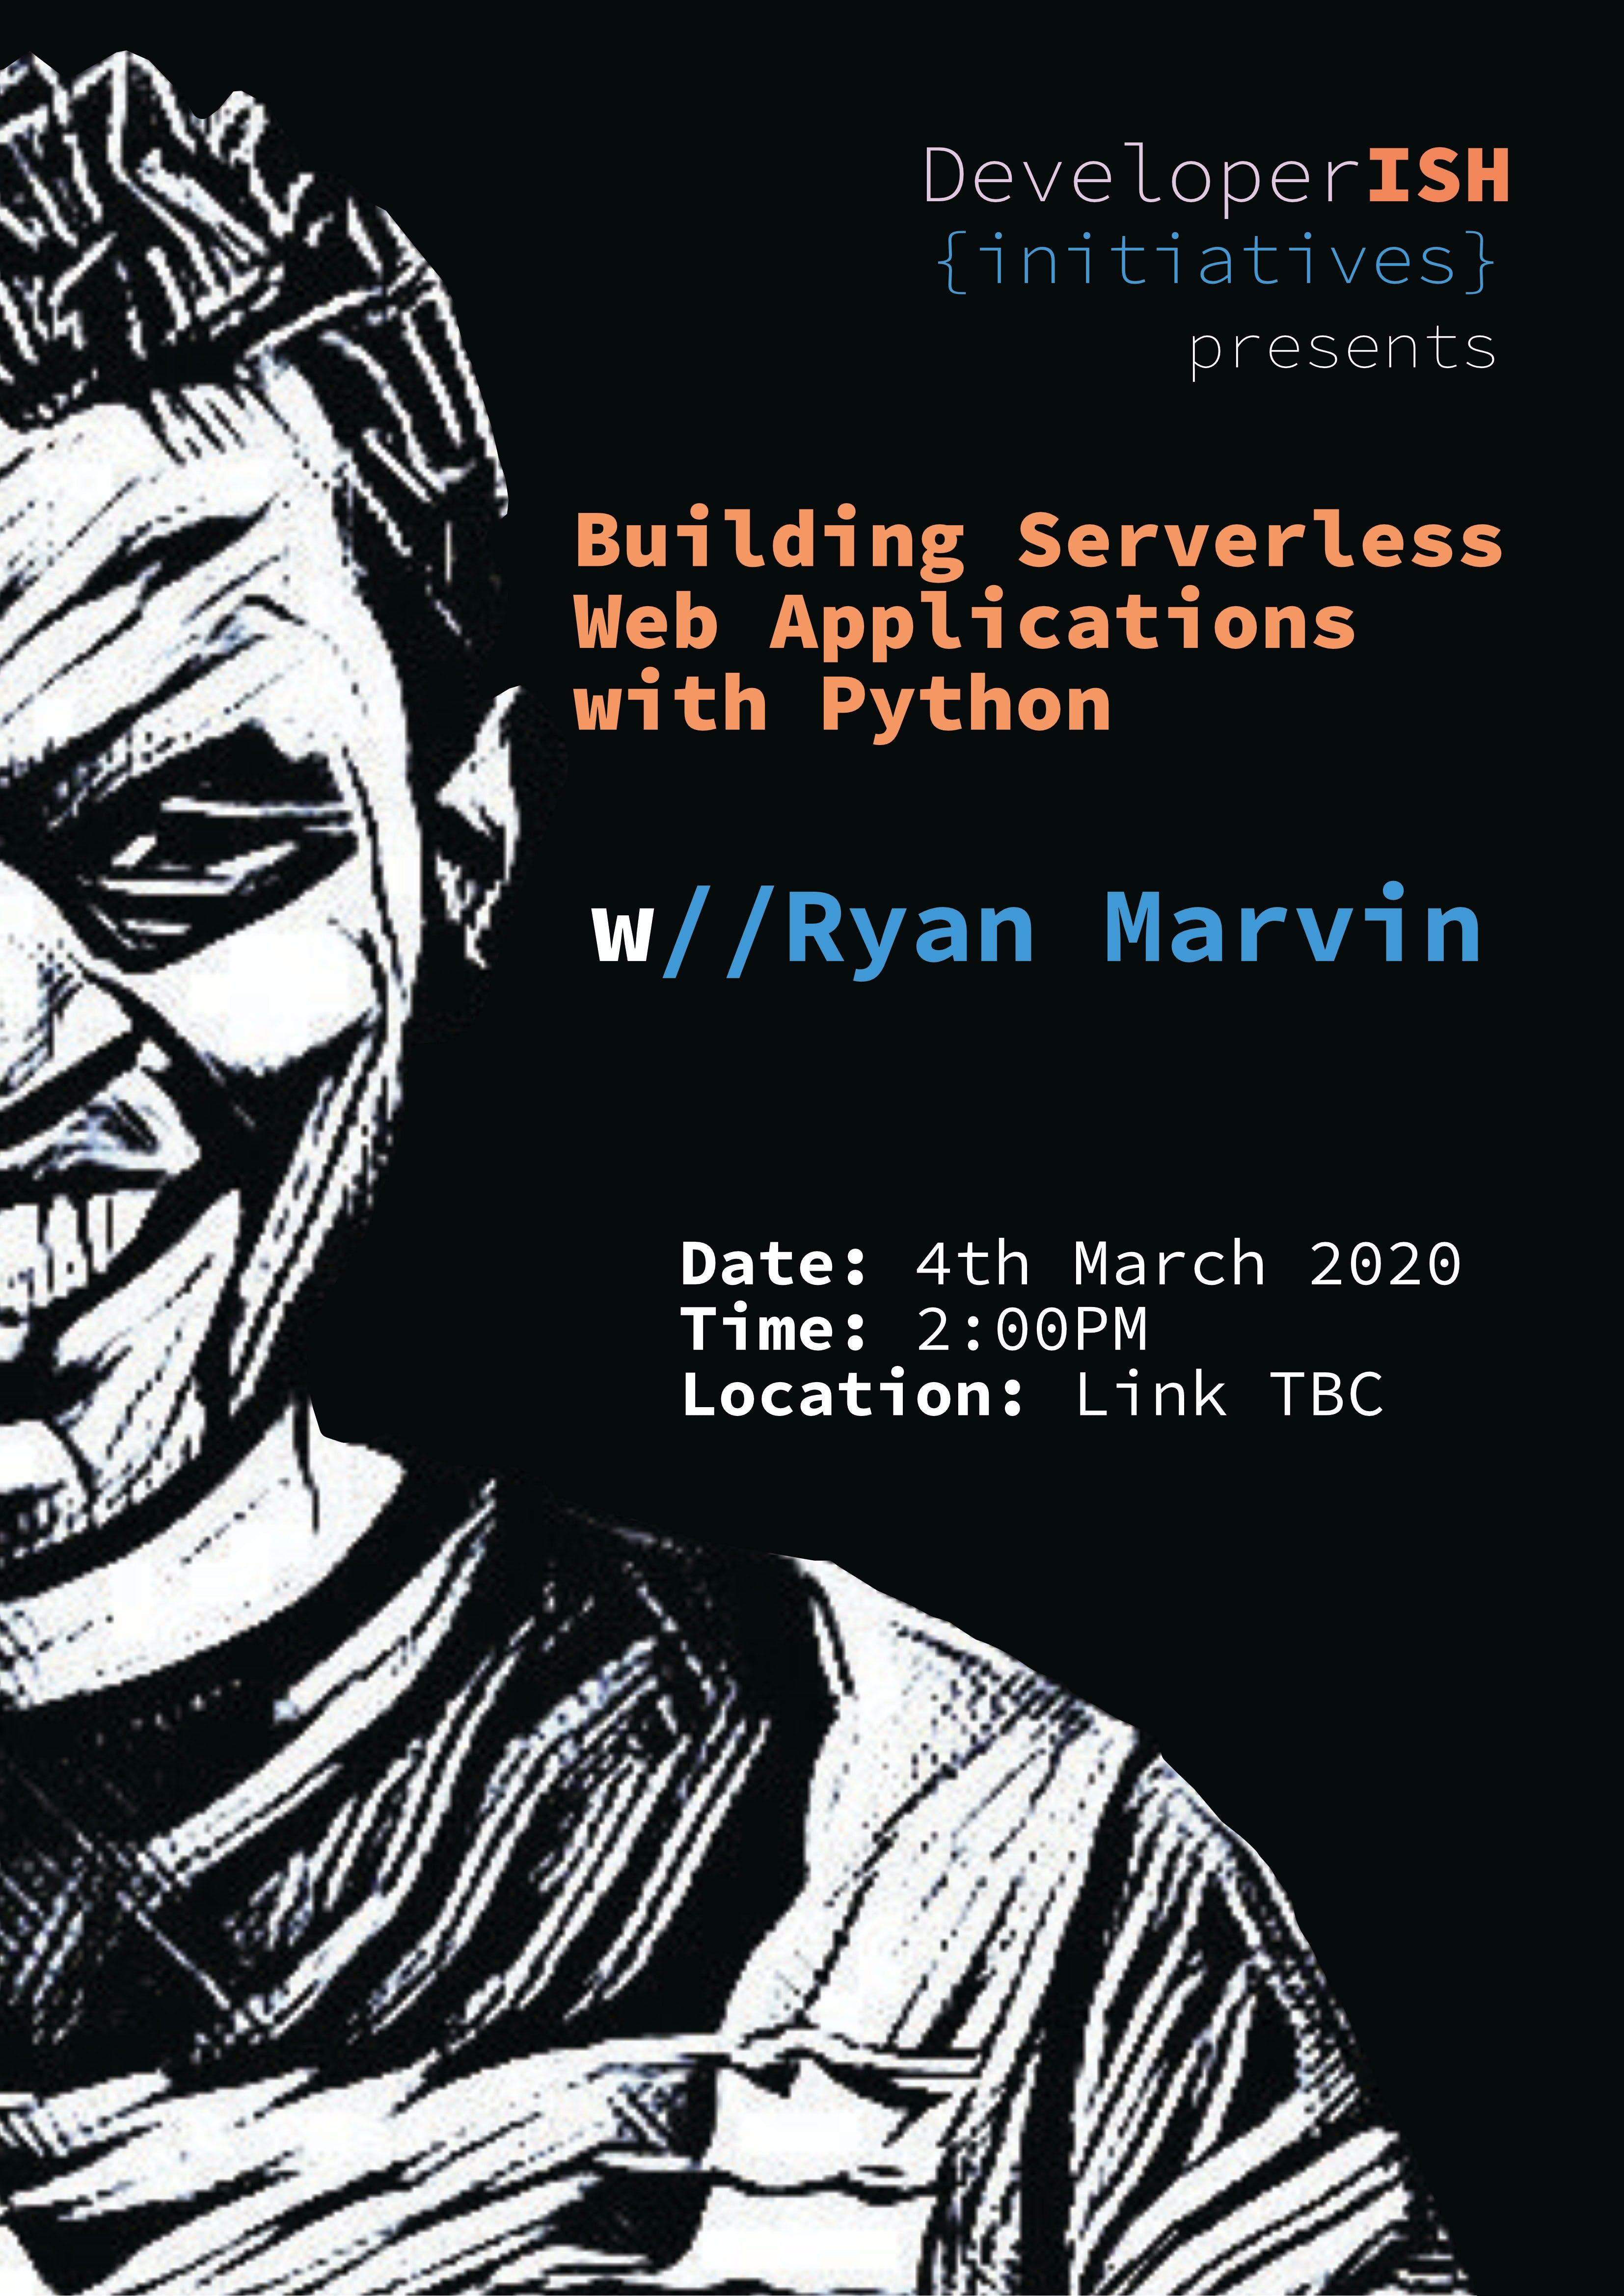 developerISH meetup #1